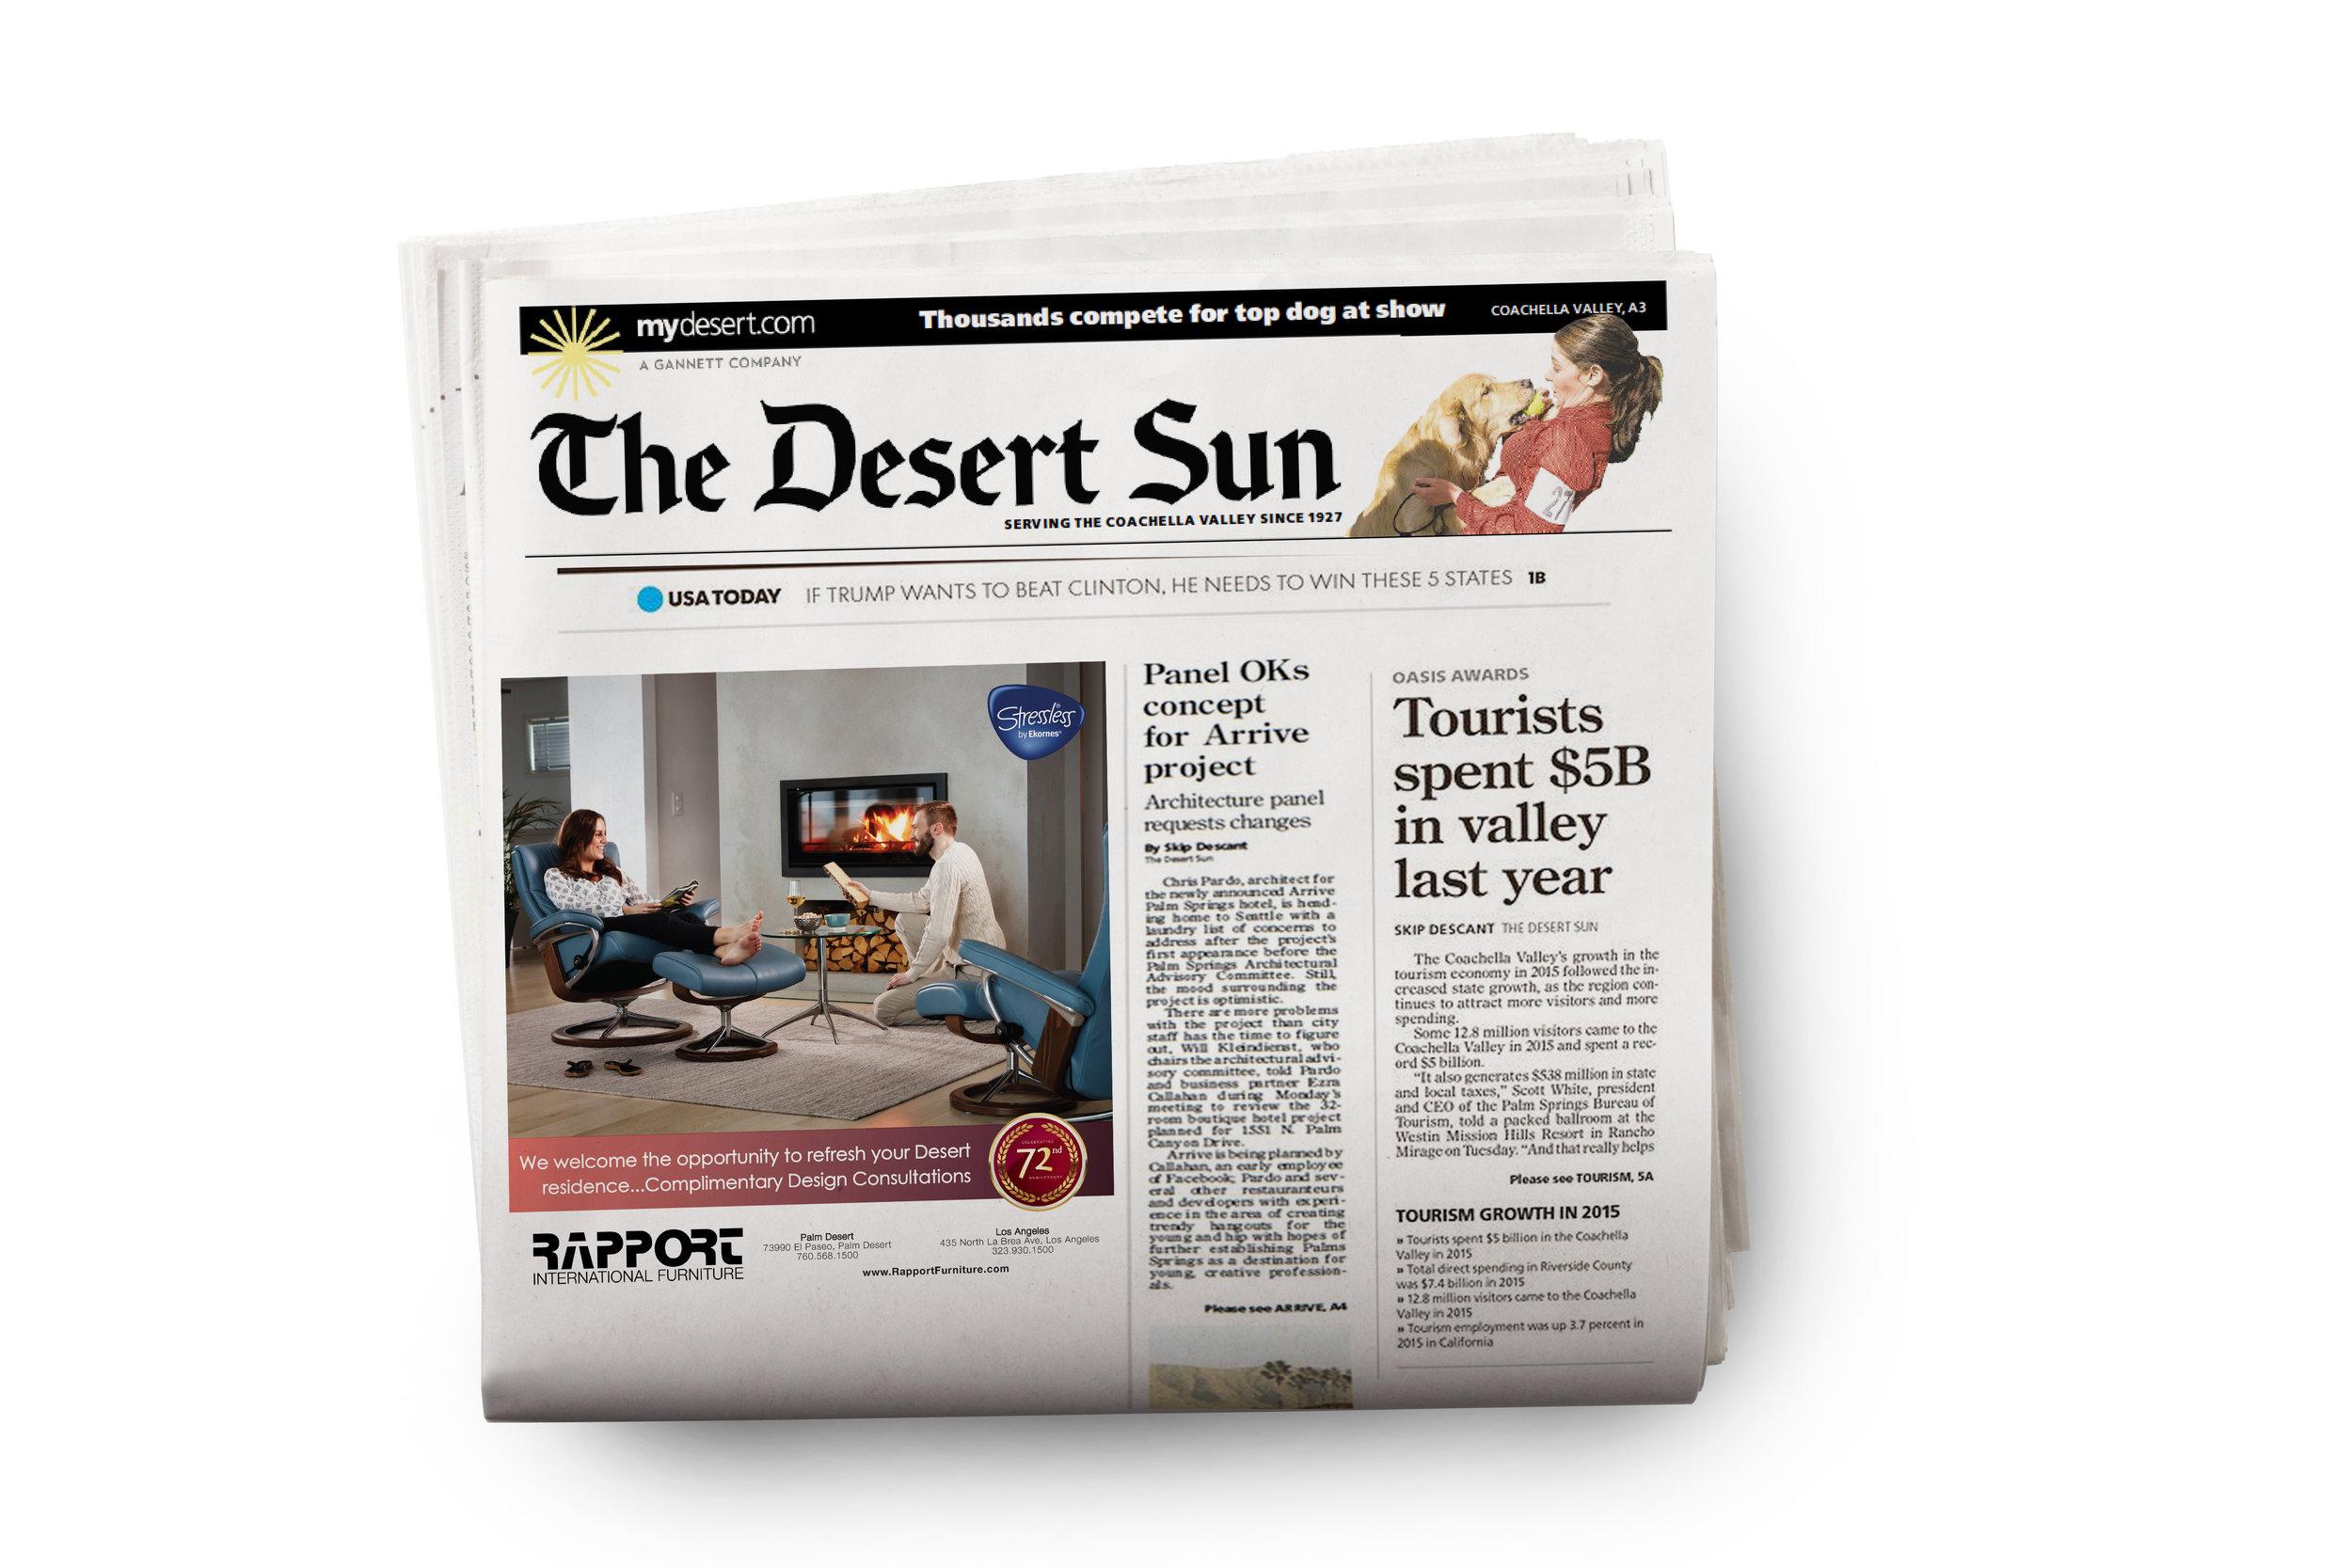 Rapport_DesertSunNewspaper_MOCKUP19.jpg